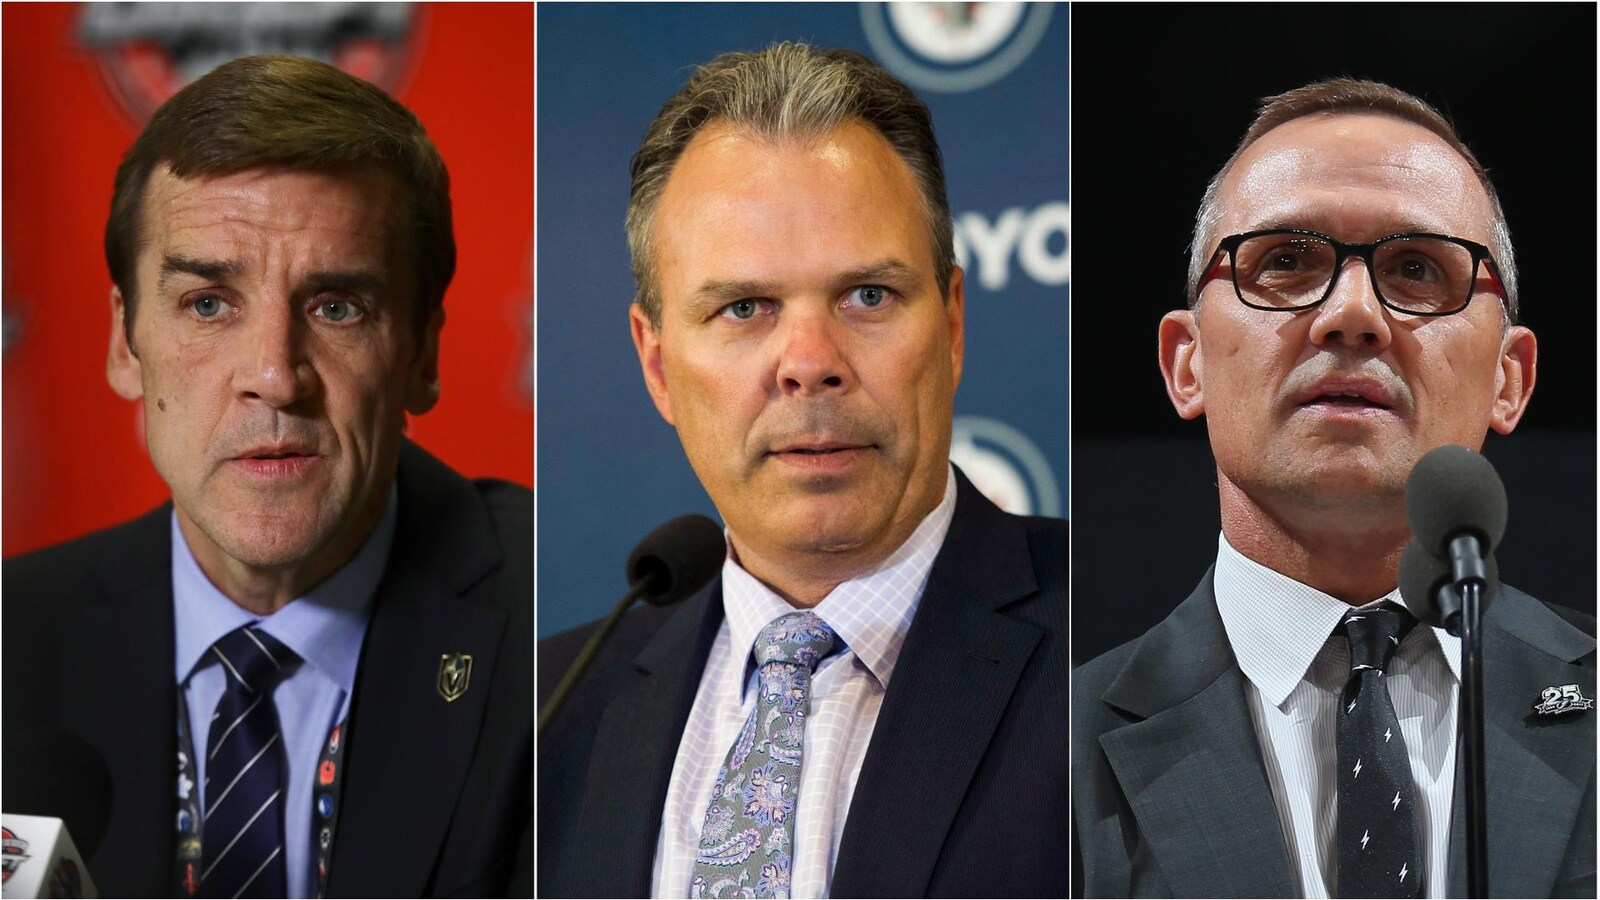 George McPhee (Vegas), Kevin Cheveldayoff (Winnipeg) et Steve Yzerman (Tampa Bay)